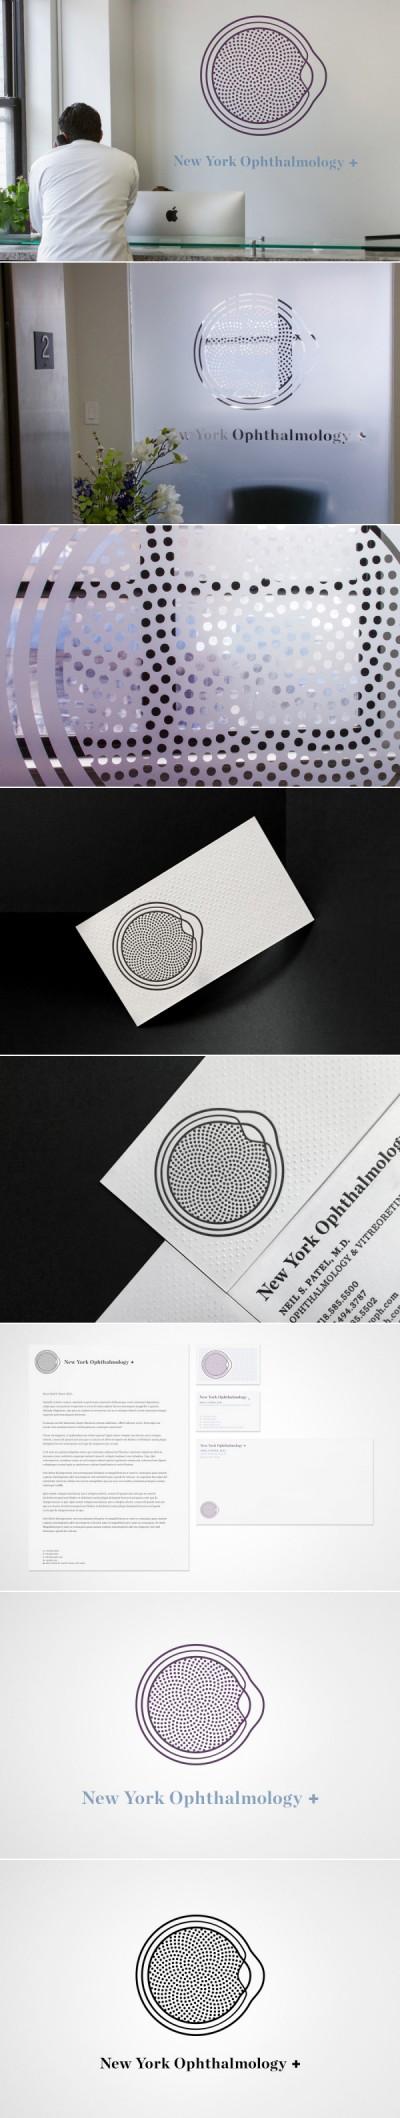 Ophtalmology - logo identity creation